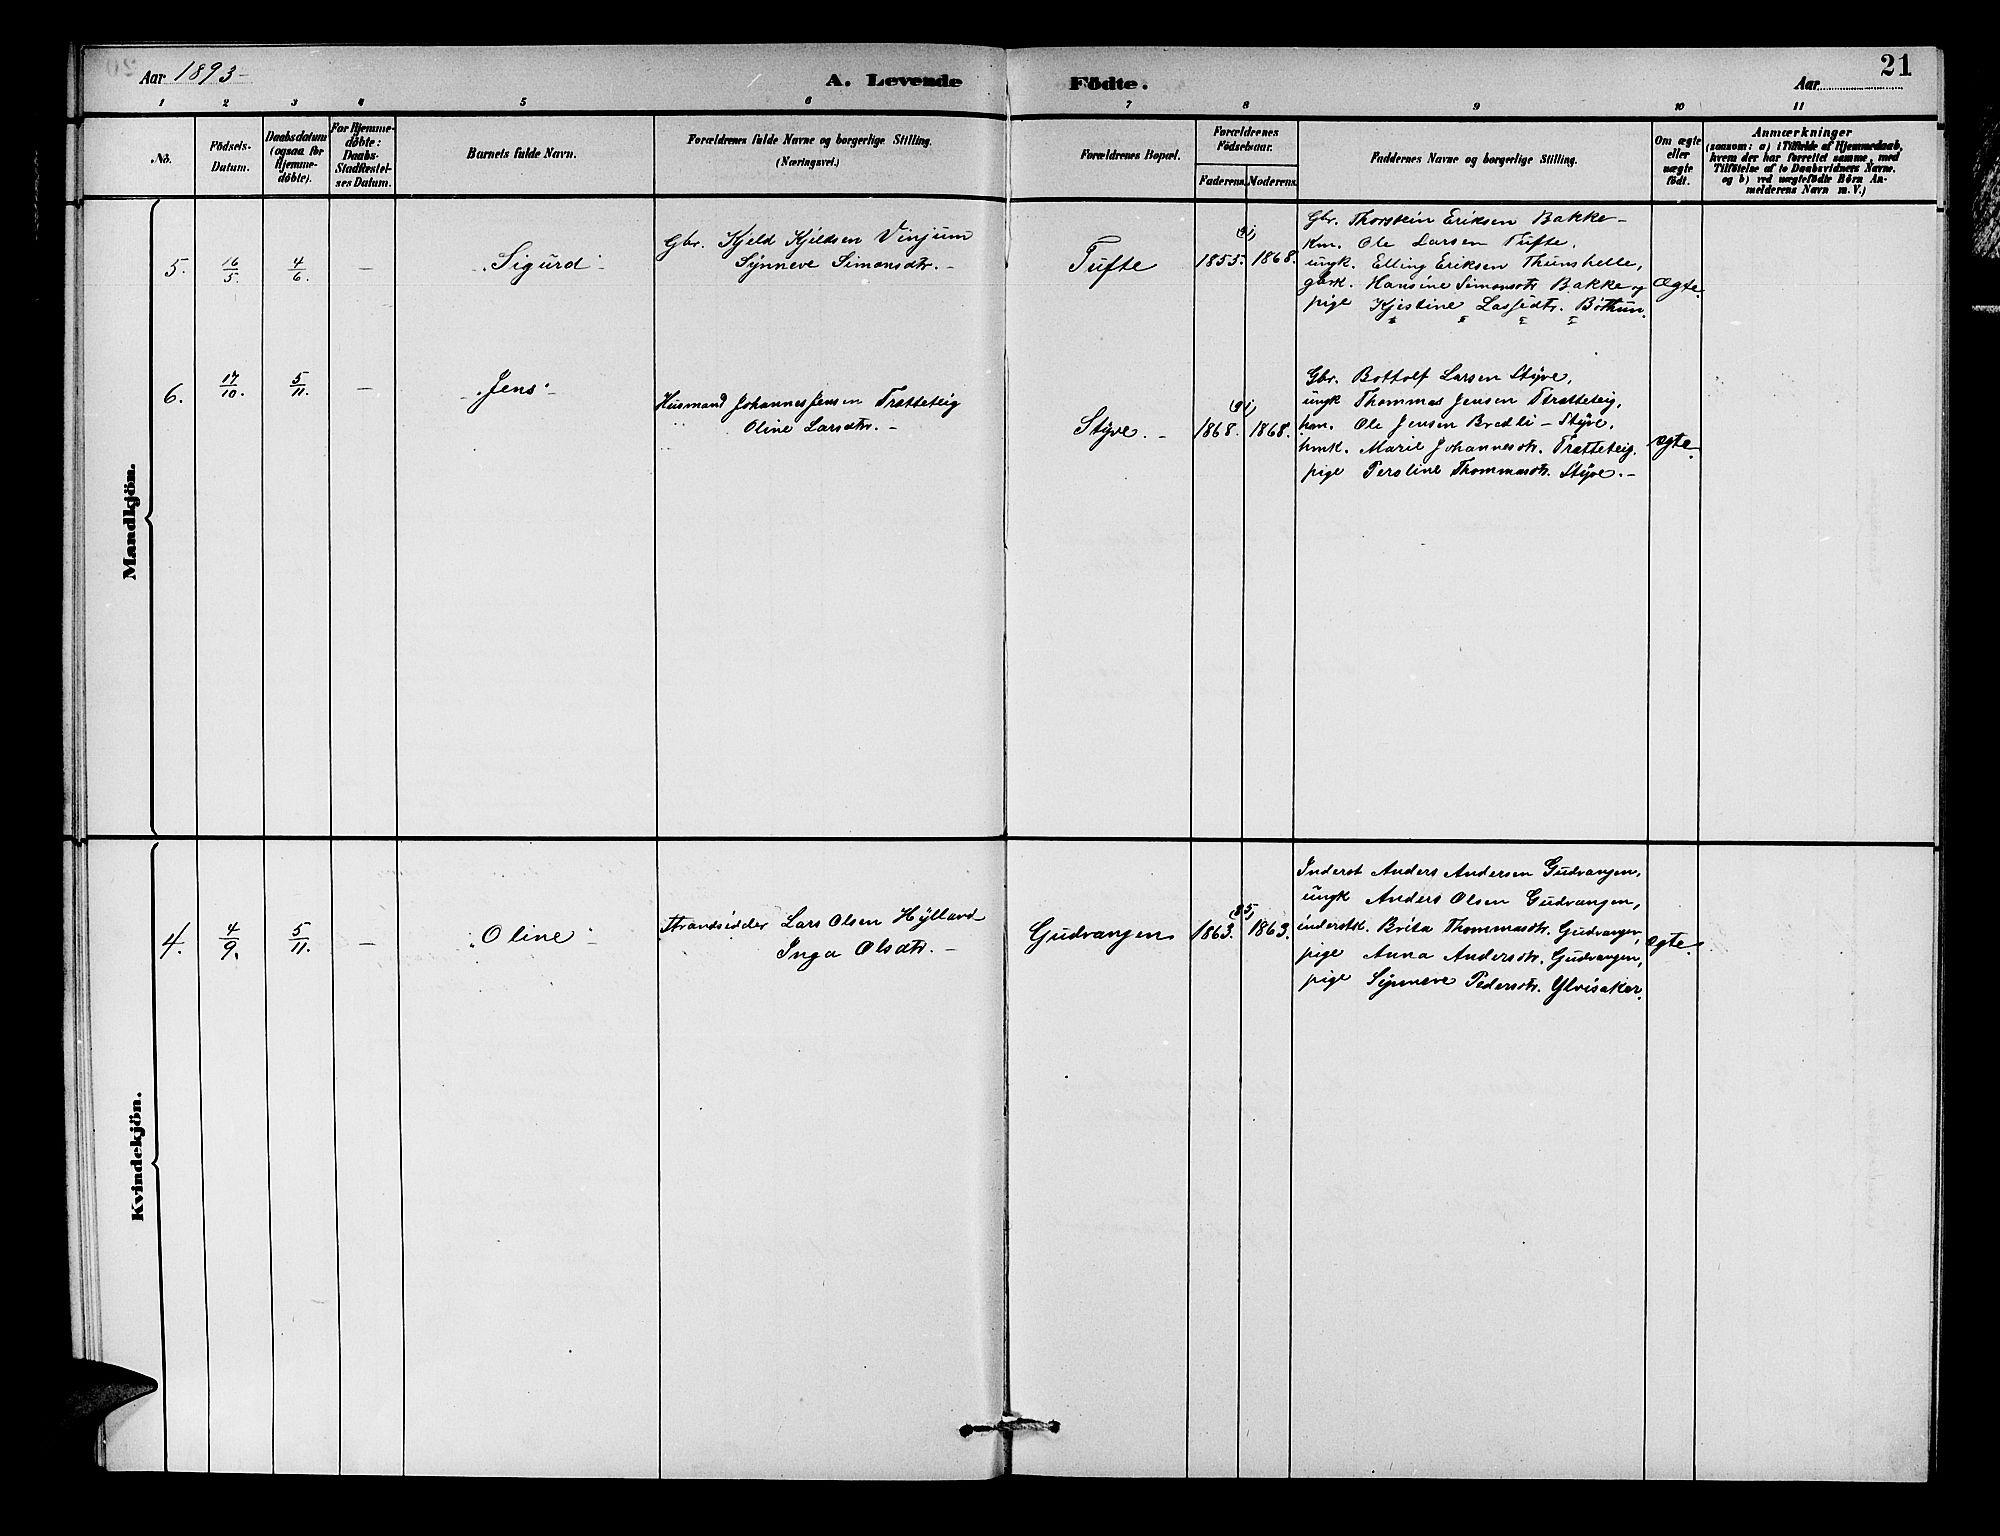 SAB, Aurland sokneprestembete, H/Hb/Hbc/L0002: Klokkerbok nr. C 2, 1883-1900, s. 21